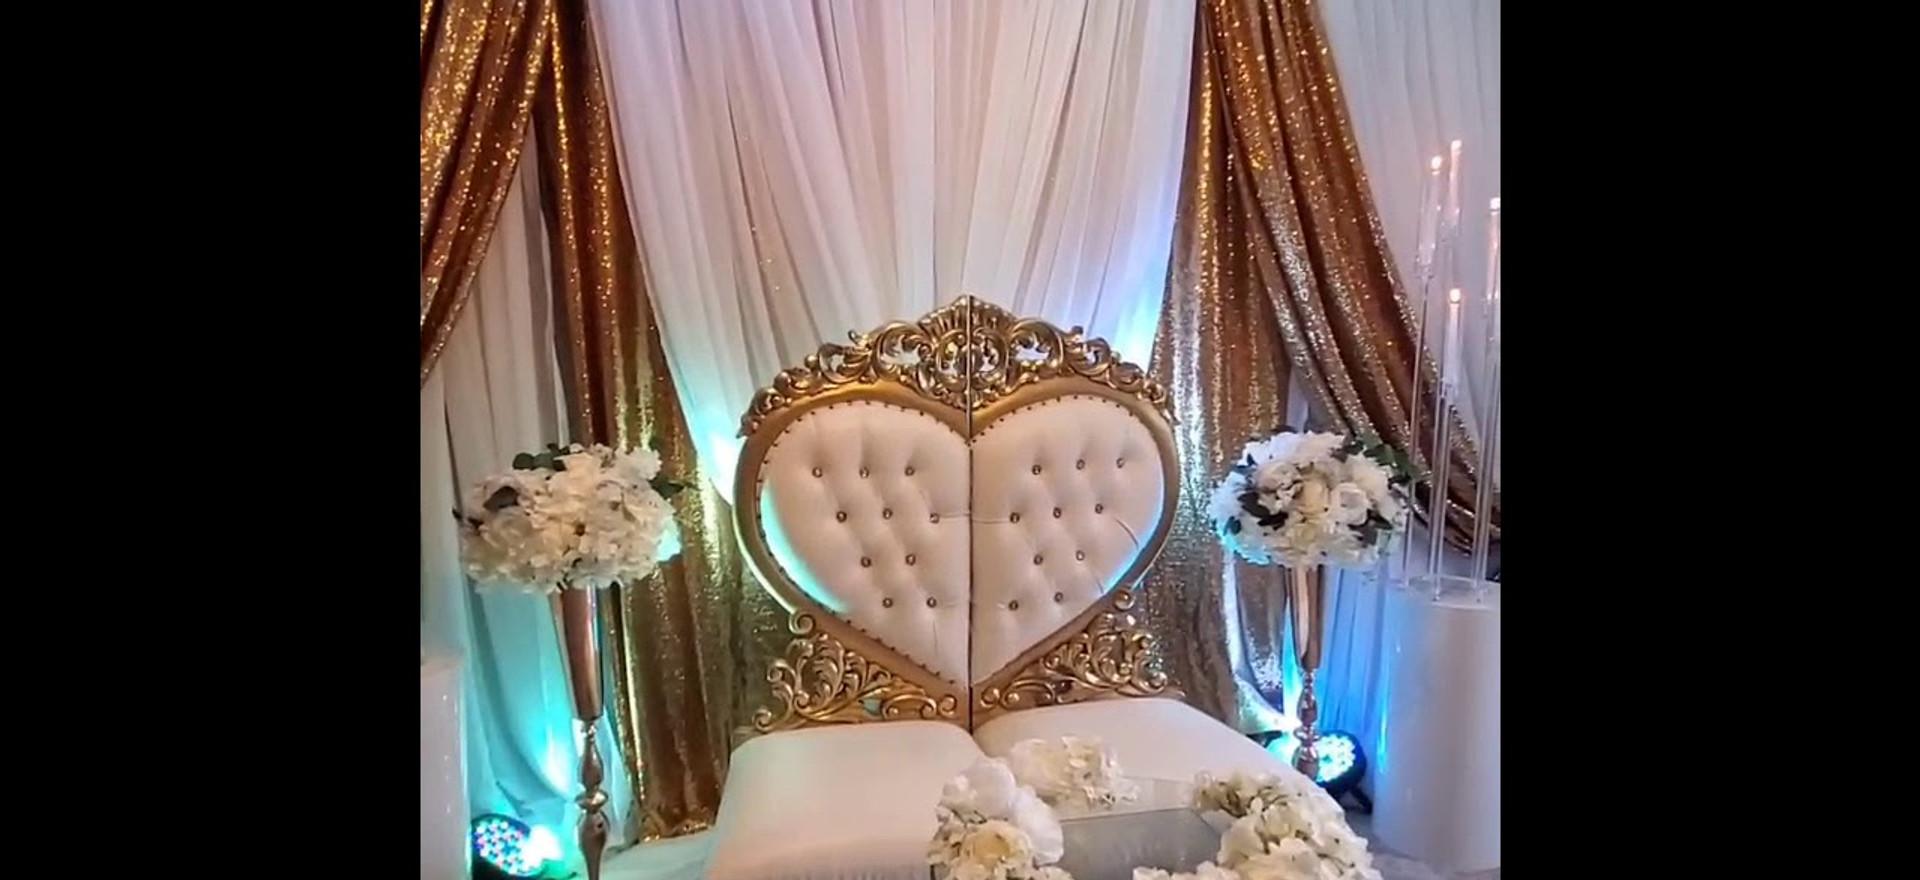 Traditional wedding basement set up